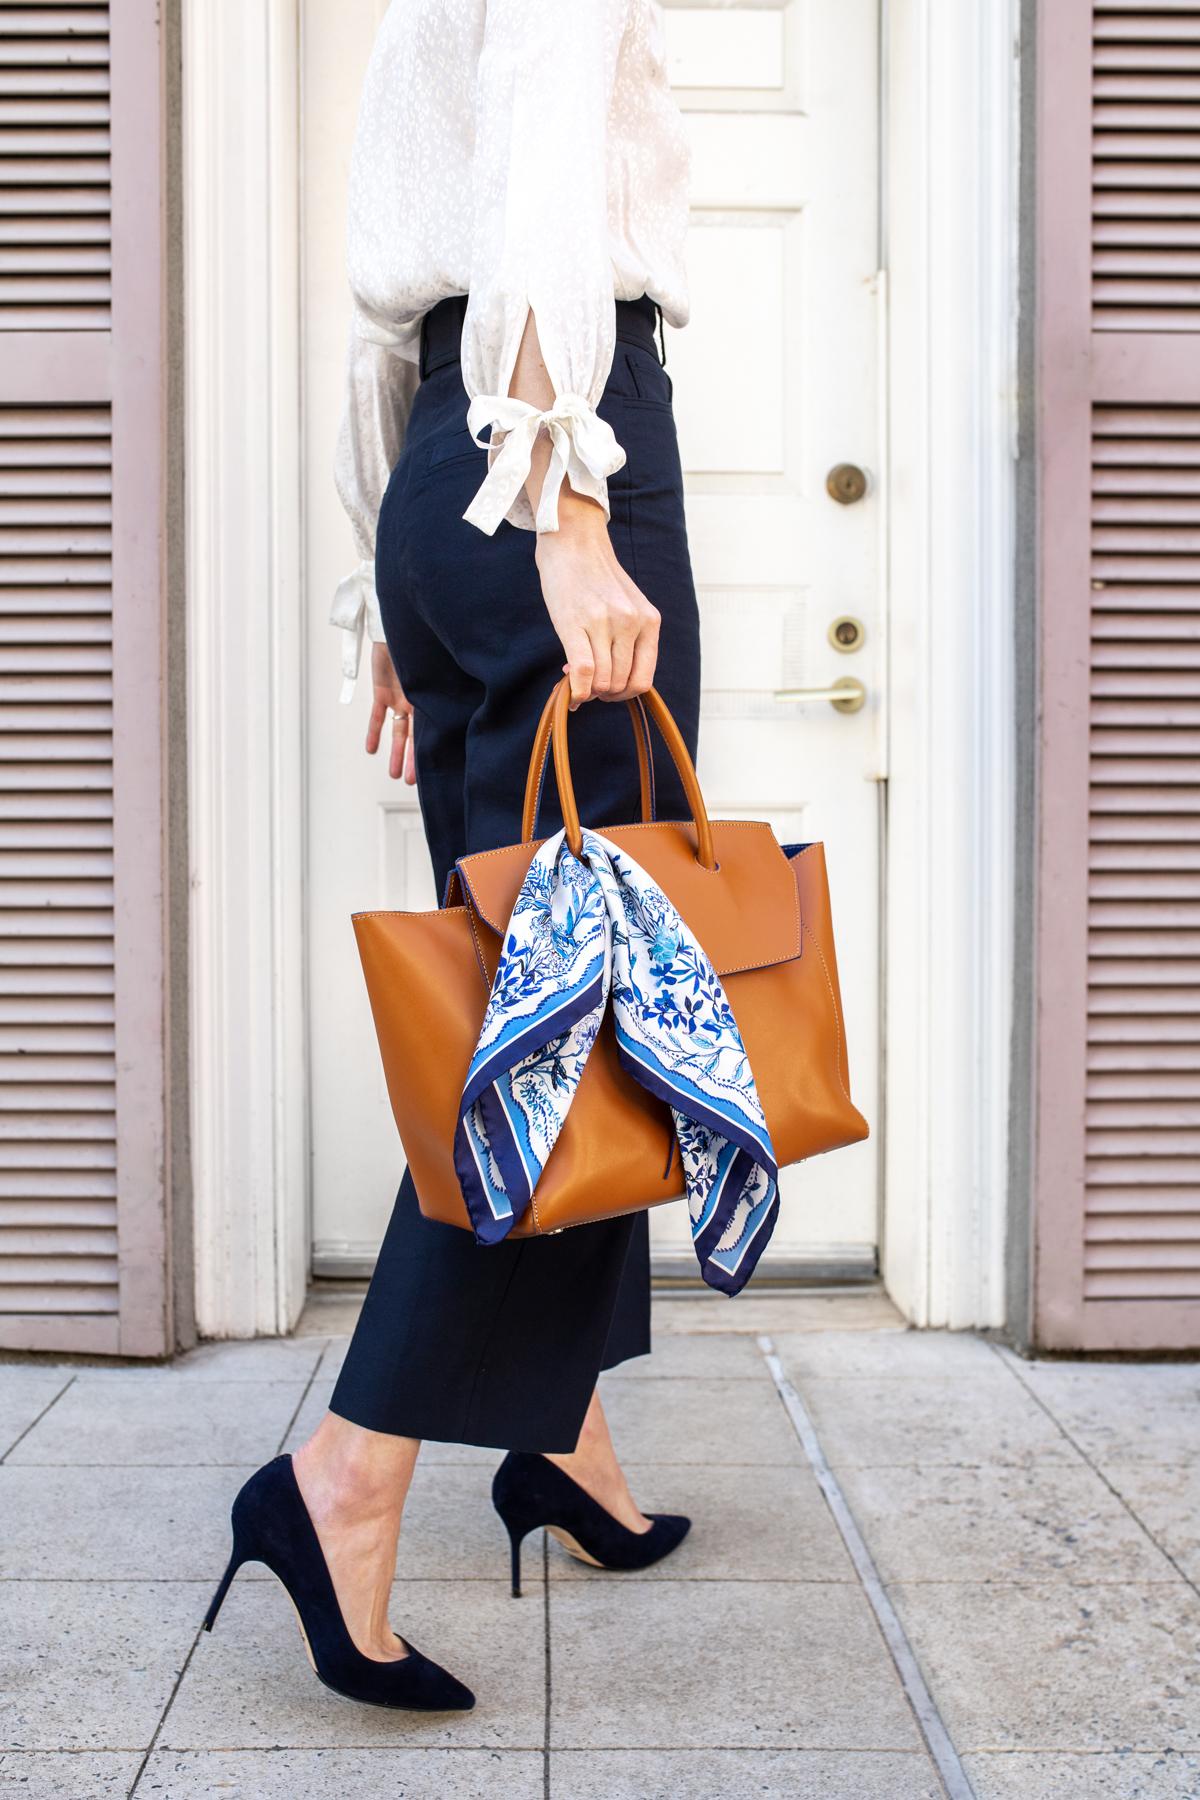 Stacie Flinner How to Style a Silk Scarf-8.jpg